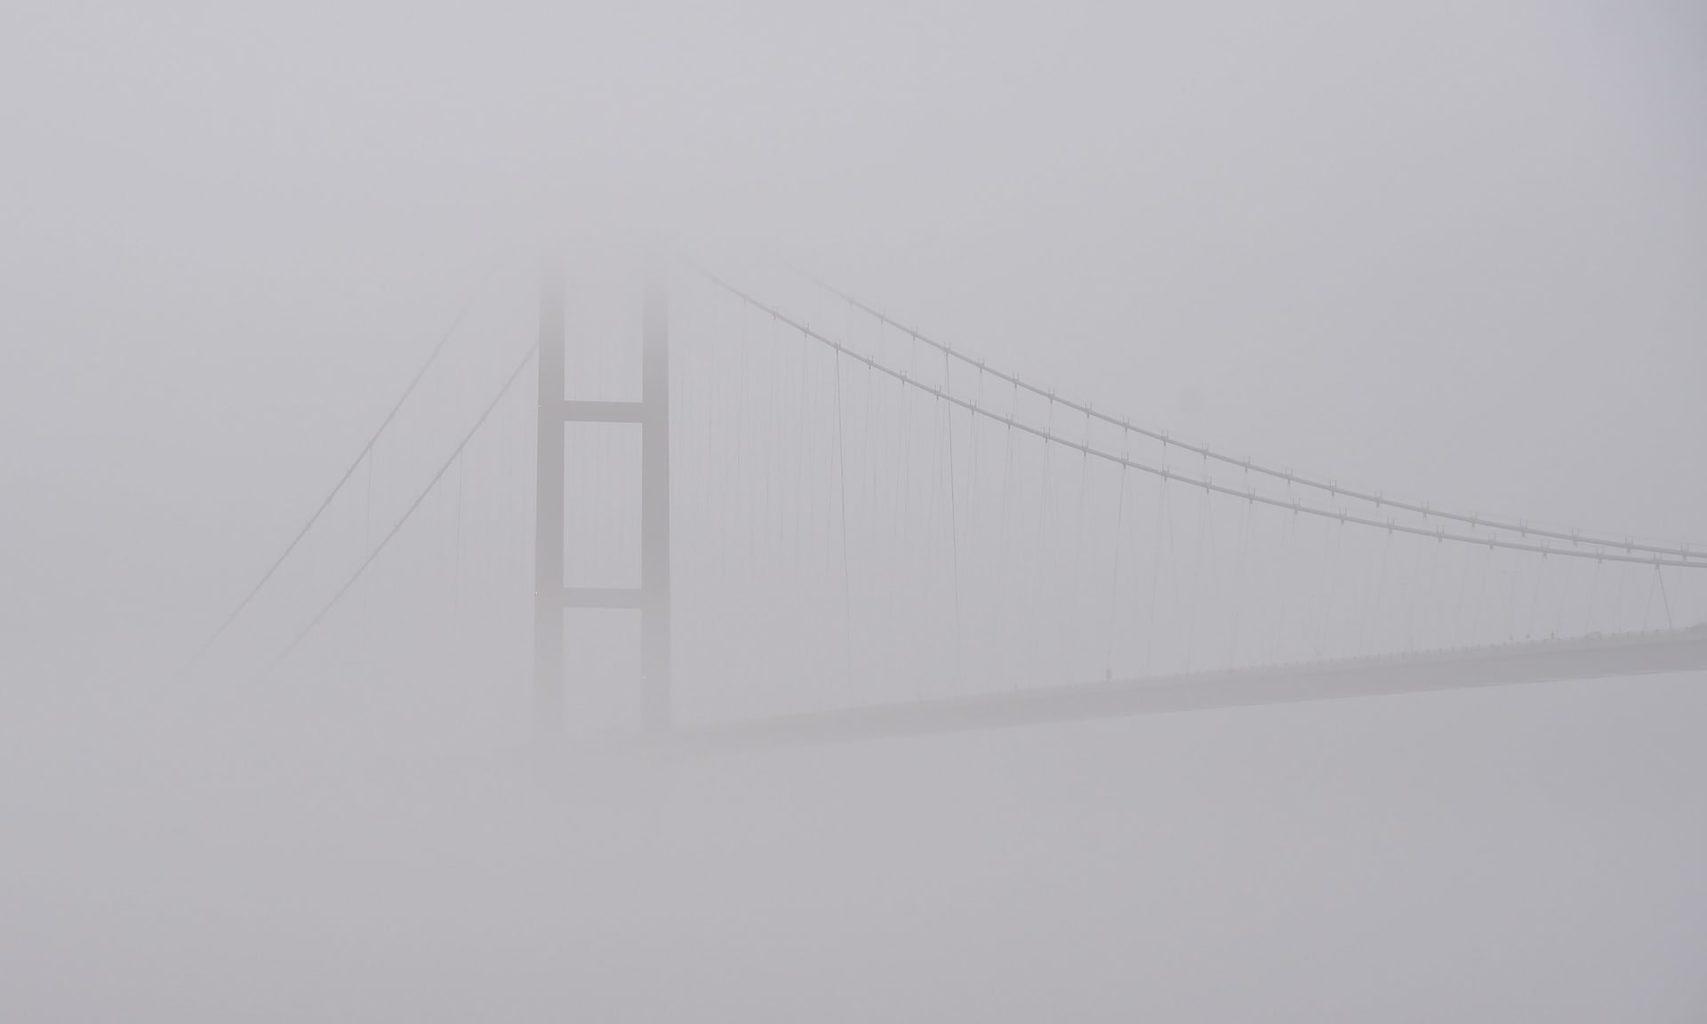 В центре тумана